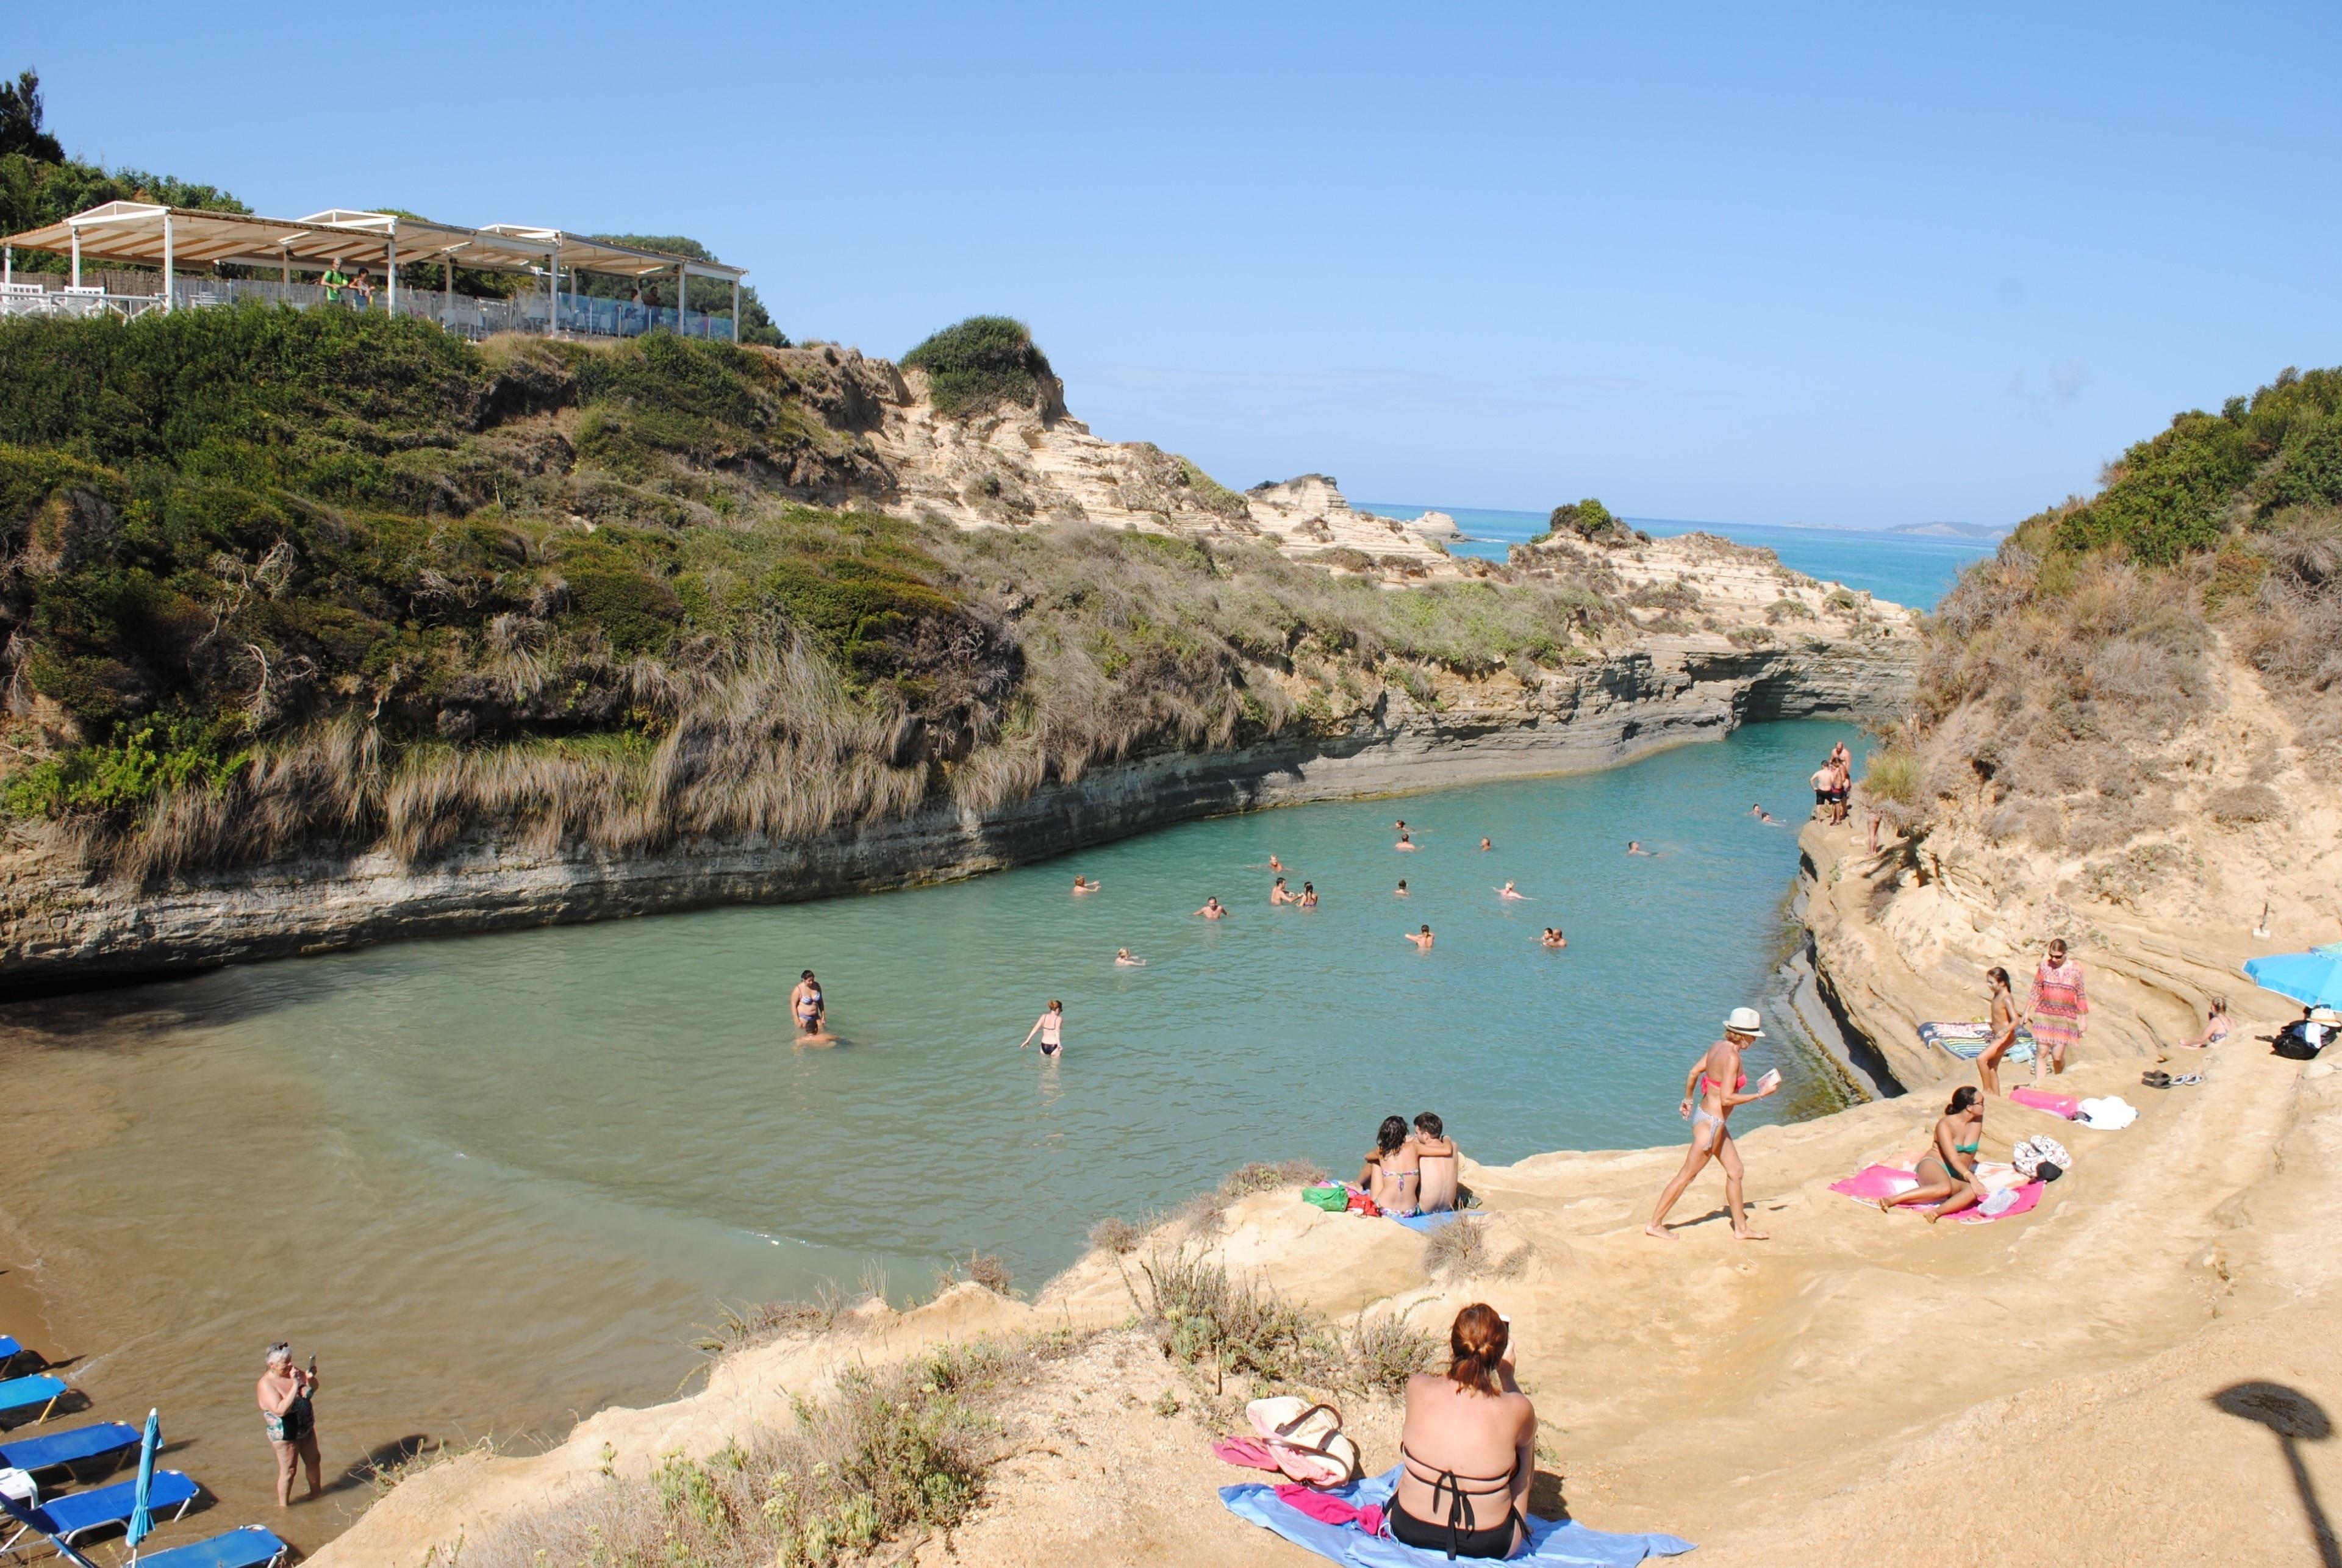 Sidari Beach, Corfu, Ionian Islands Region, Greece